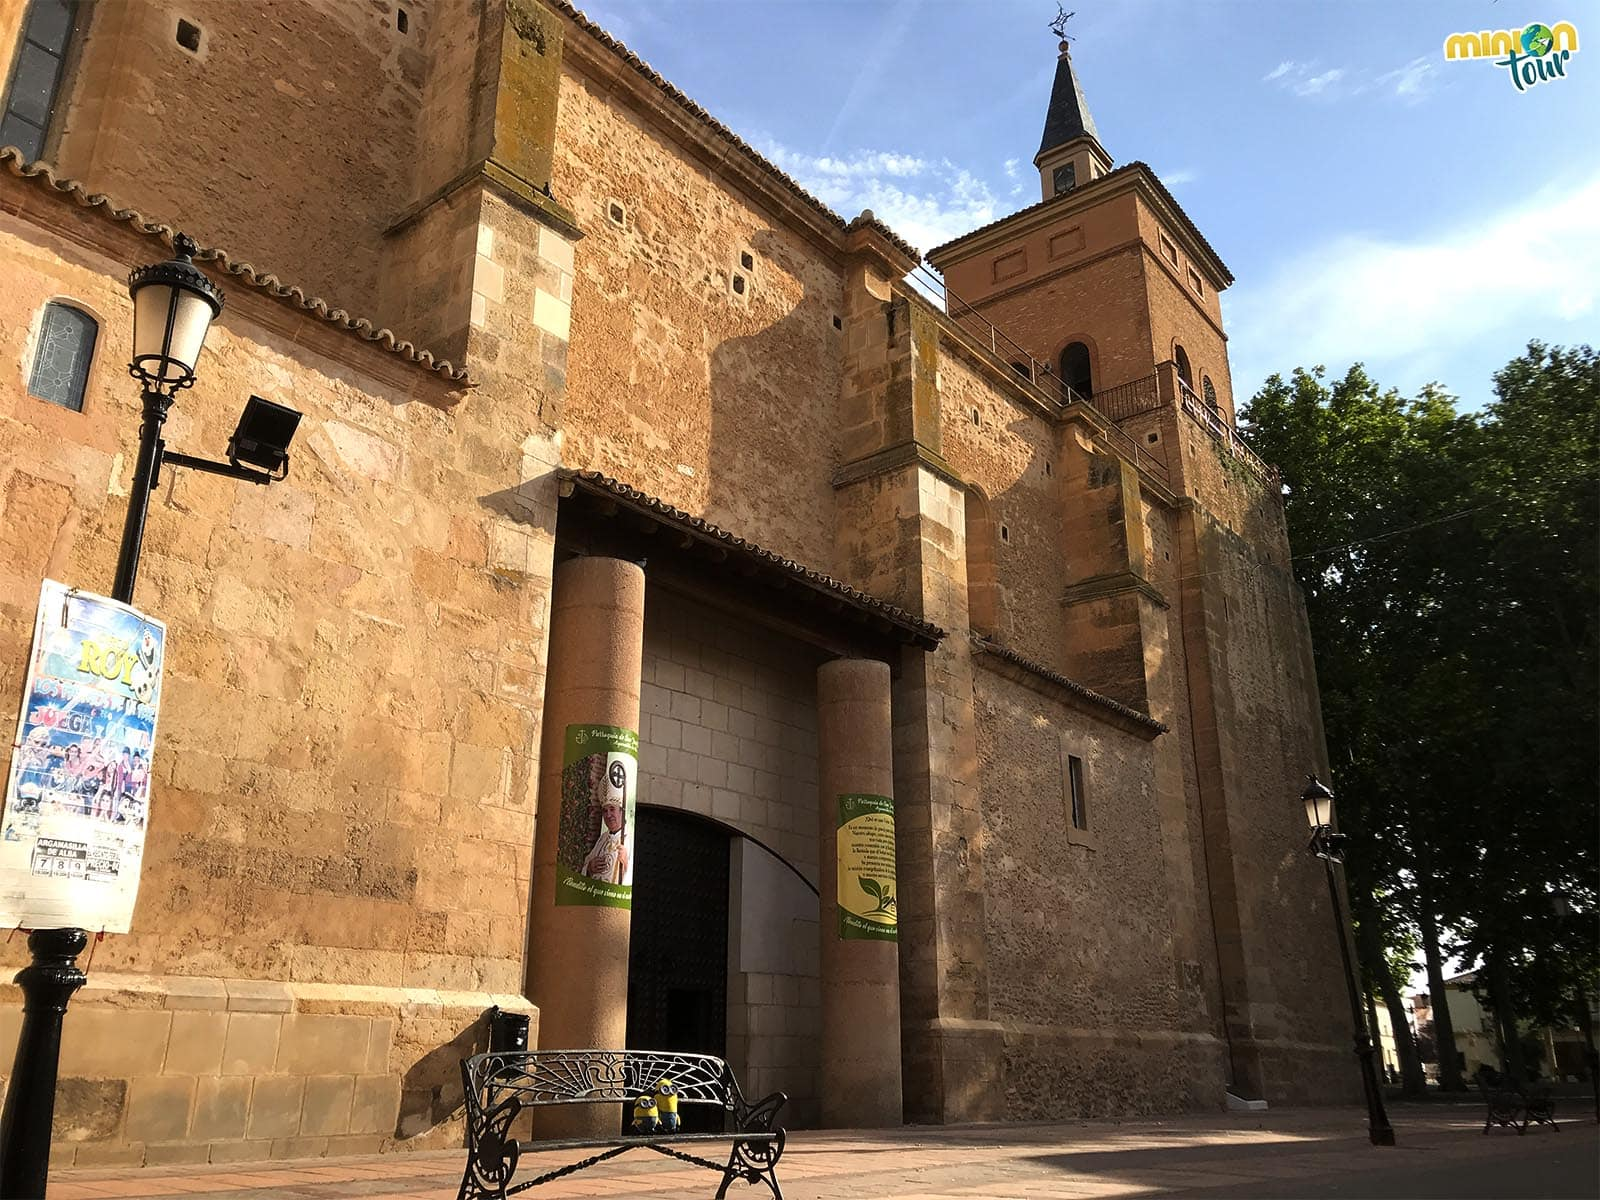 La Iglesia de San Juan Bautista en Argamasilla de Alba